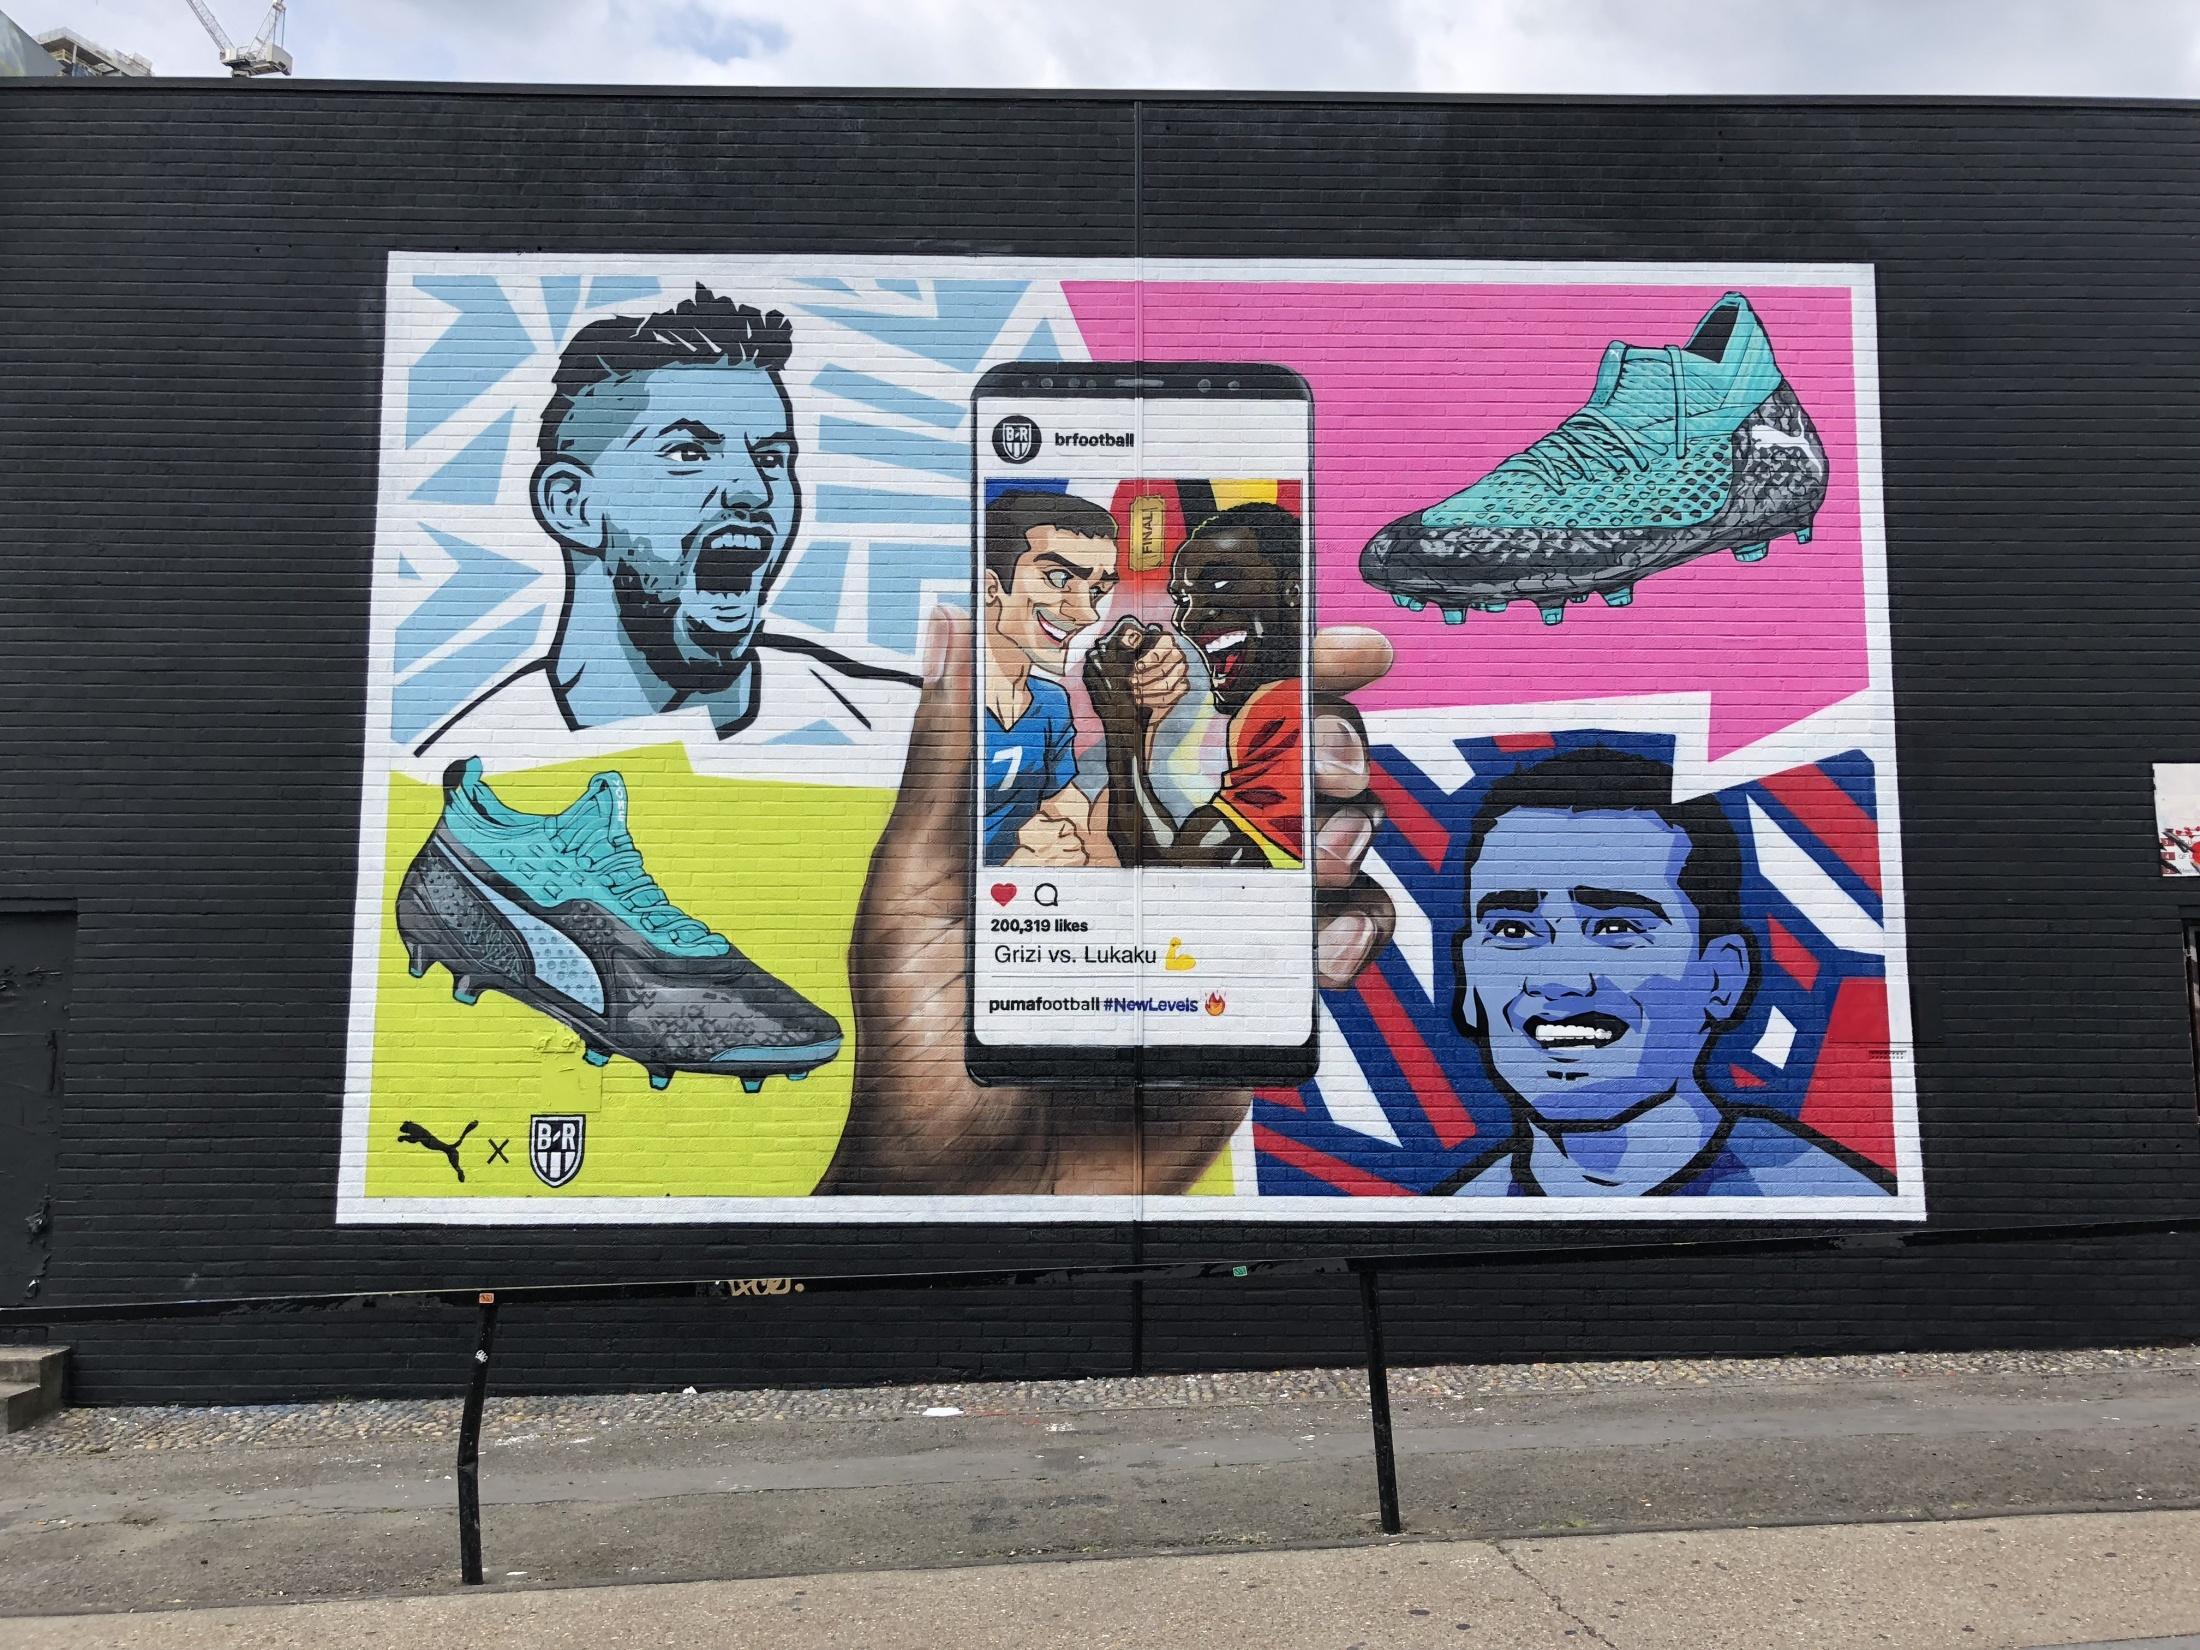 Thumbnail for Puma (UK) x B/R Football - Interactive Football Murals